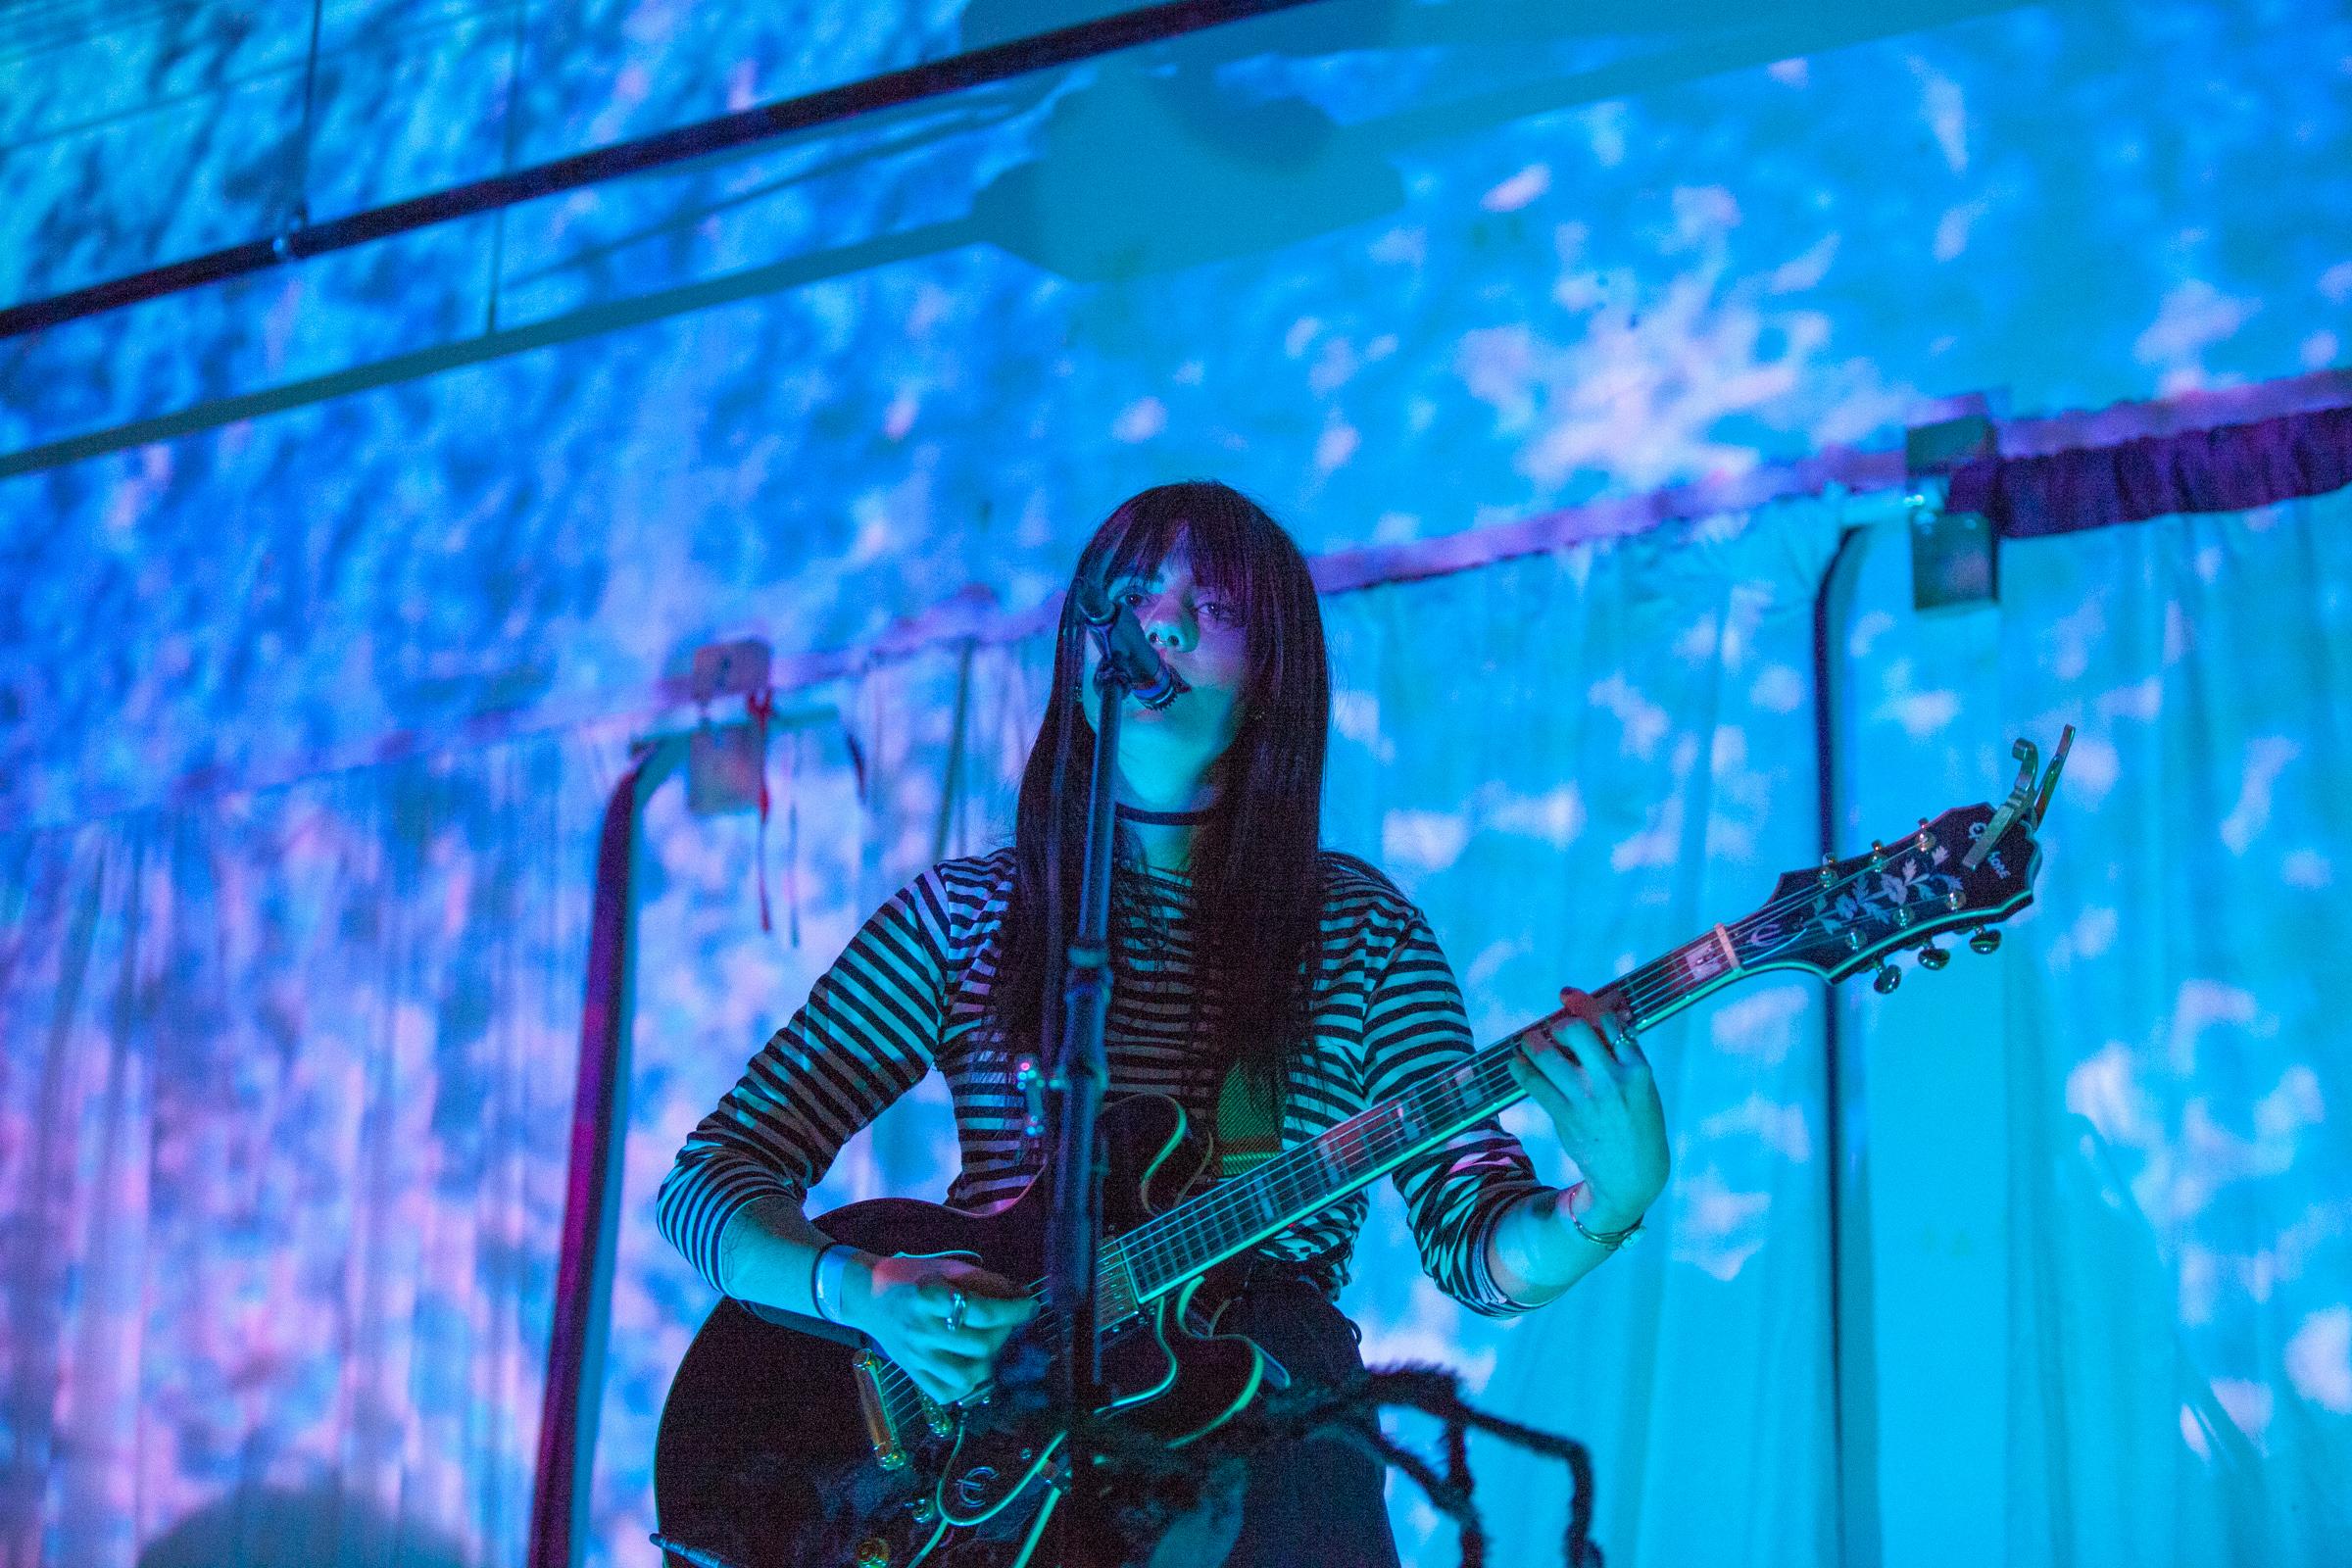 Wilma Laverne Miner - Photo: Dónal Cían Lakatua - GCR Fest 2018